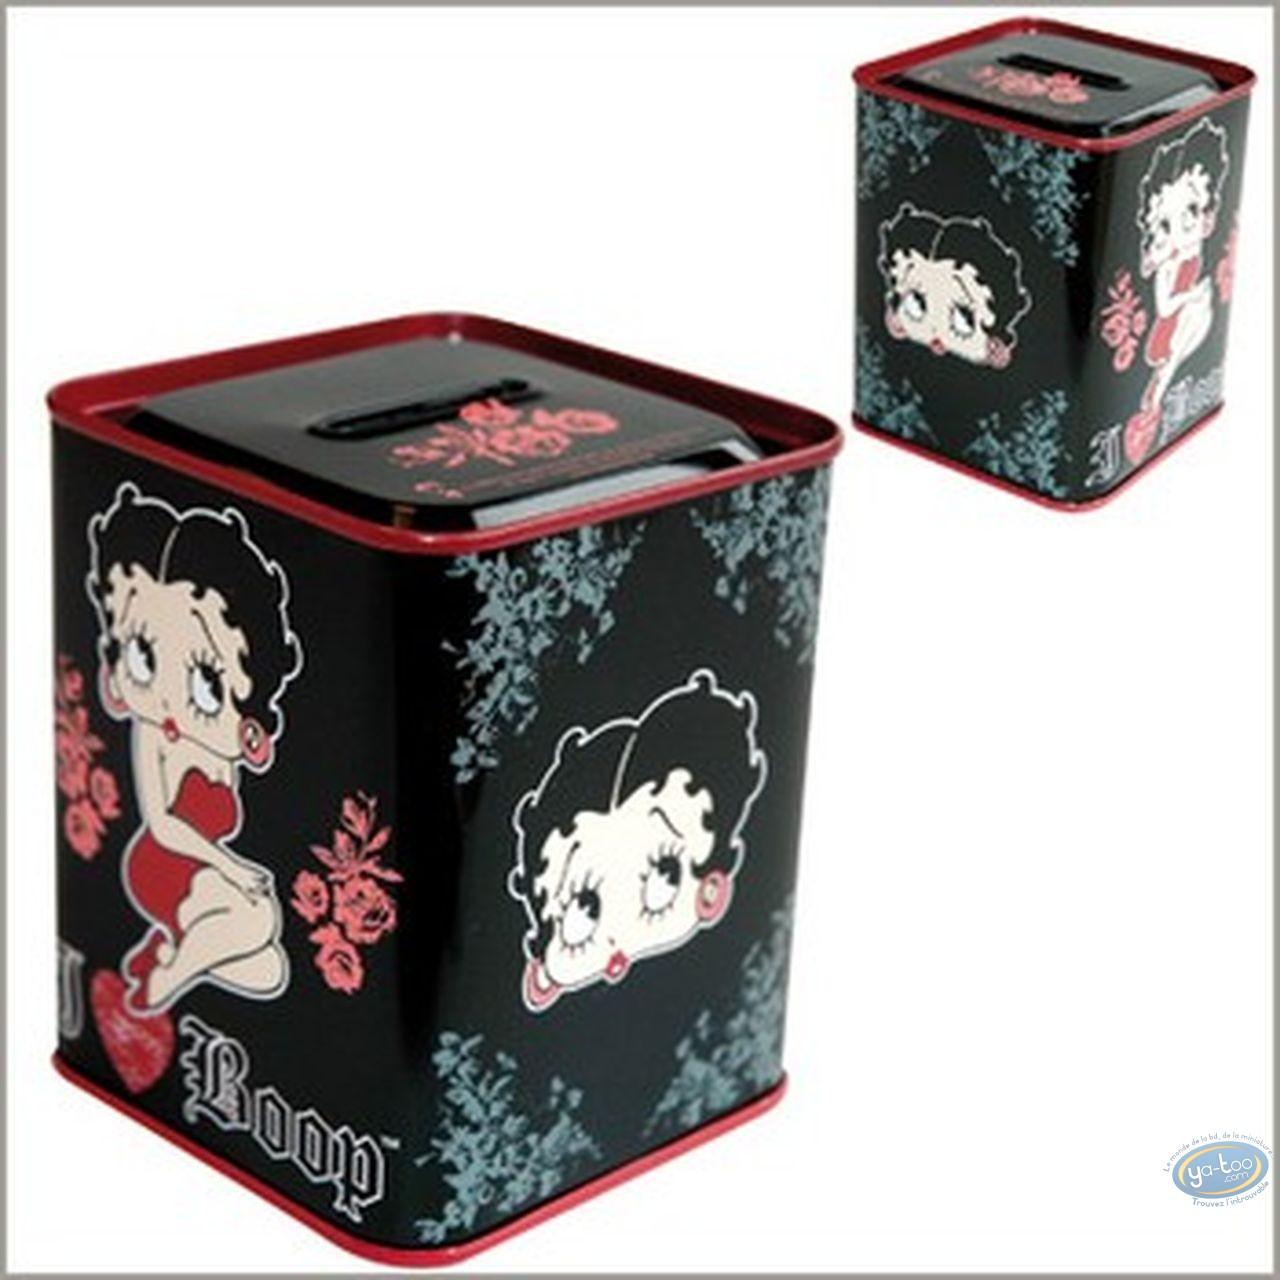 Tirelire, Betty Boop : Tirelire Betty Boop (noire)